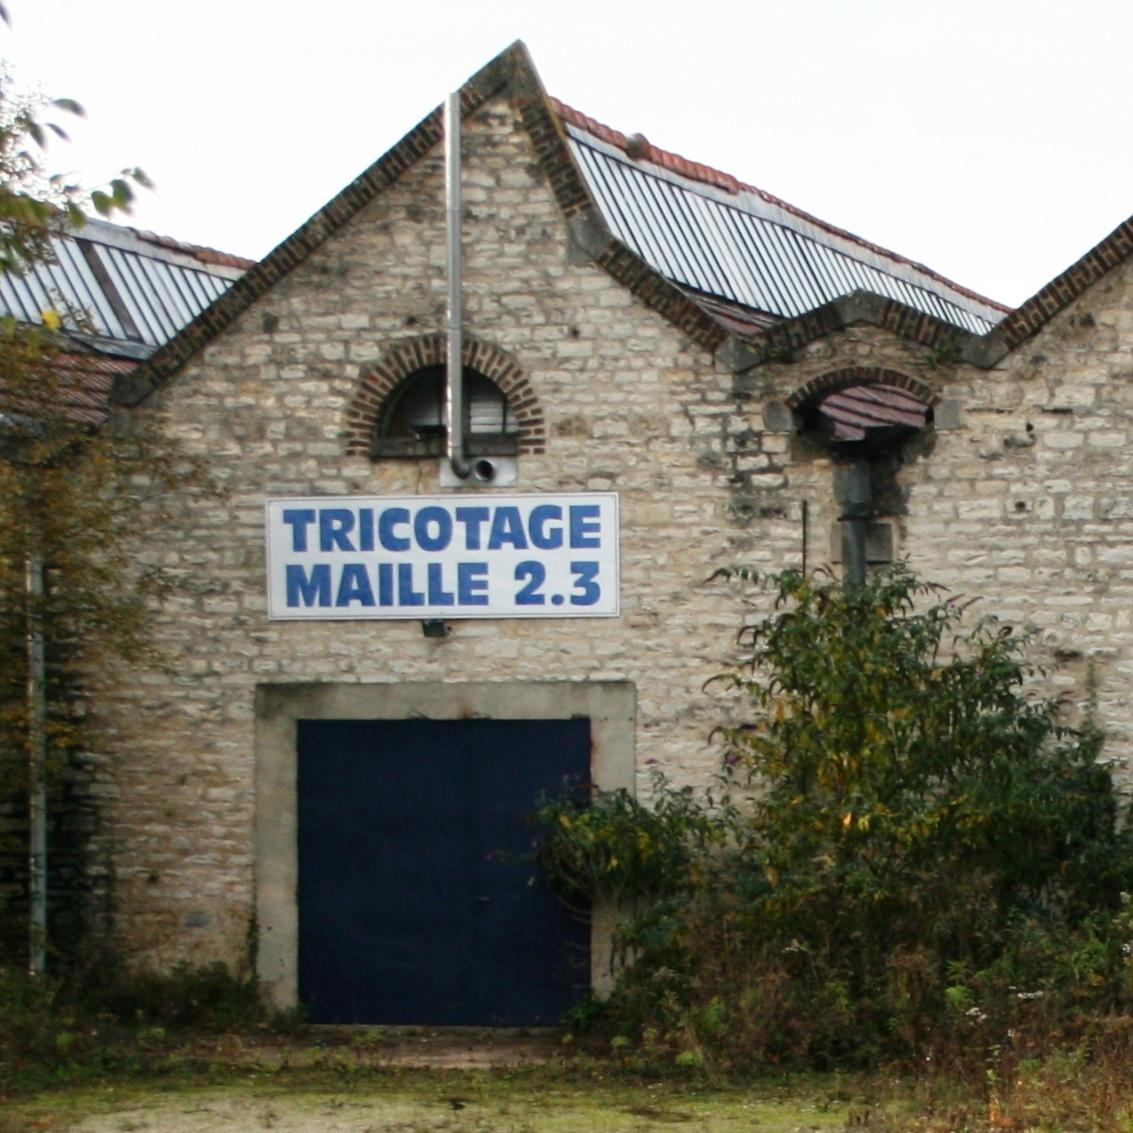 Tricotage gautier